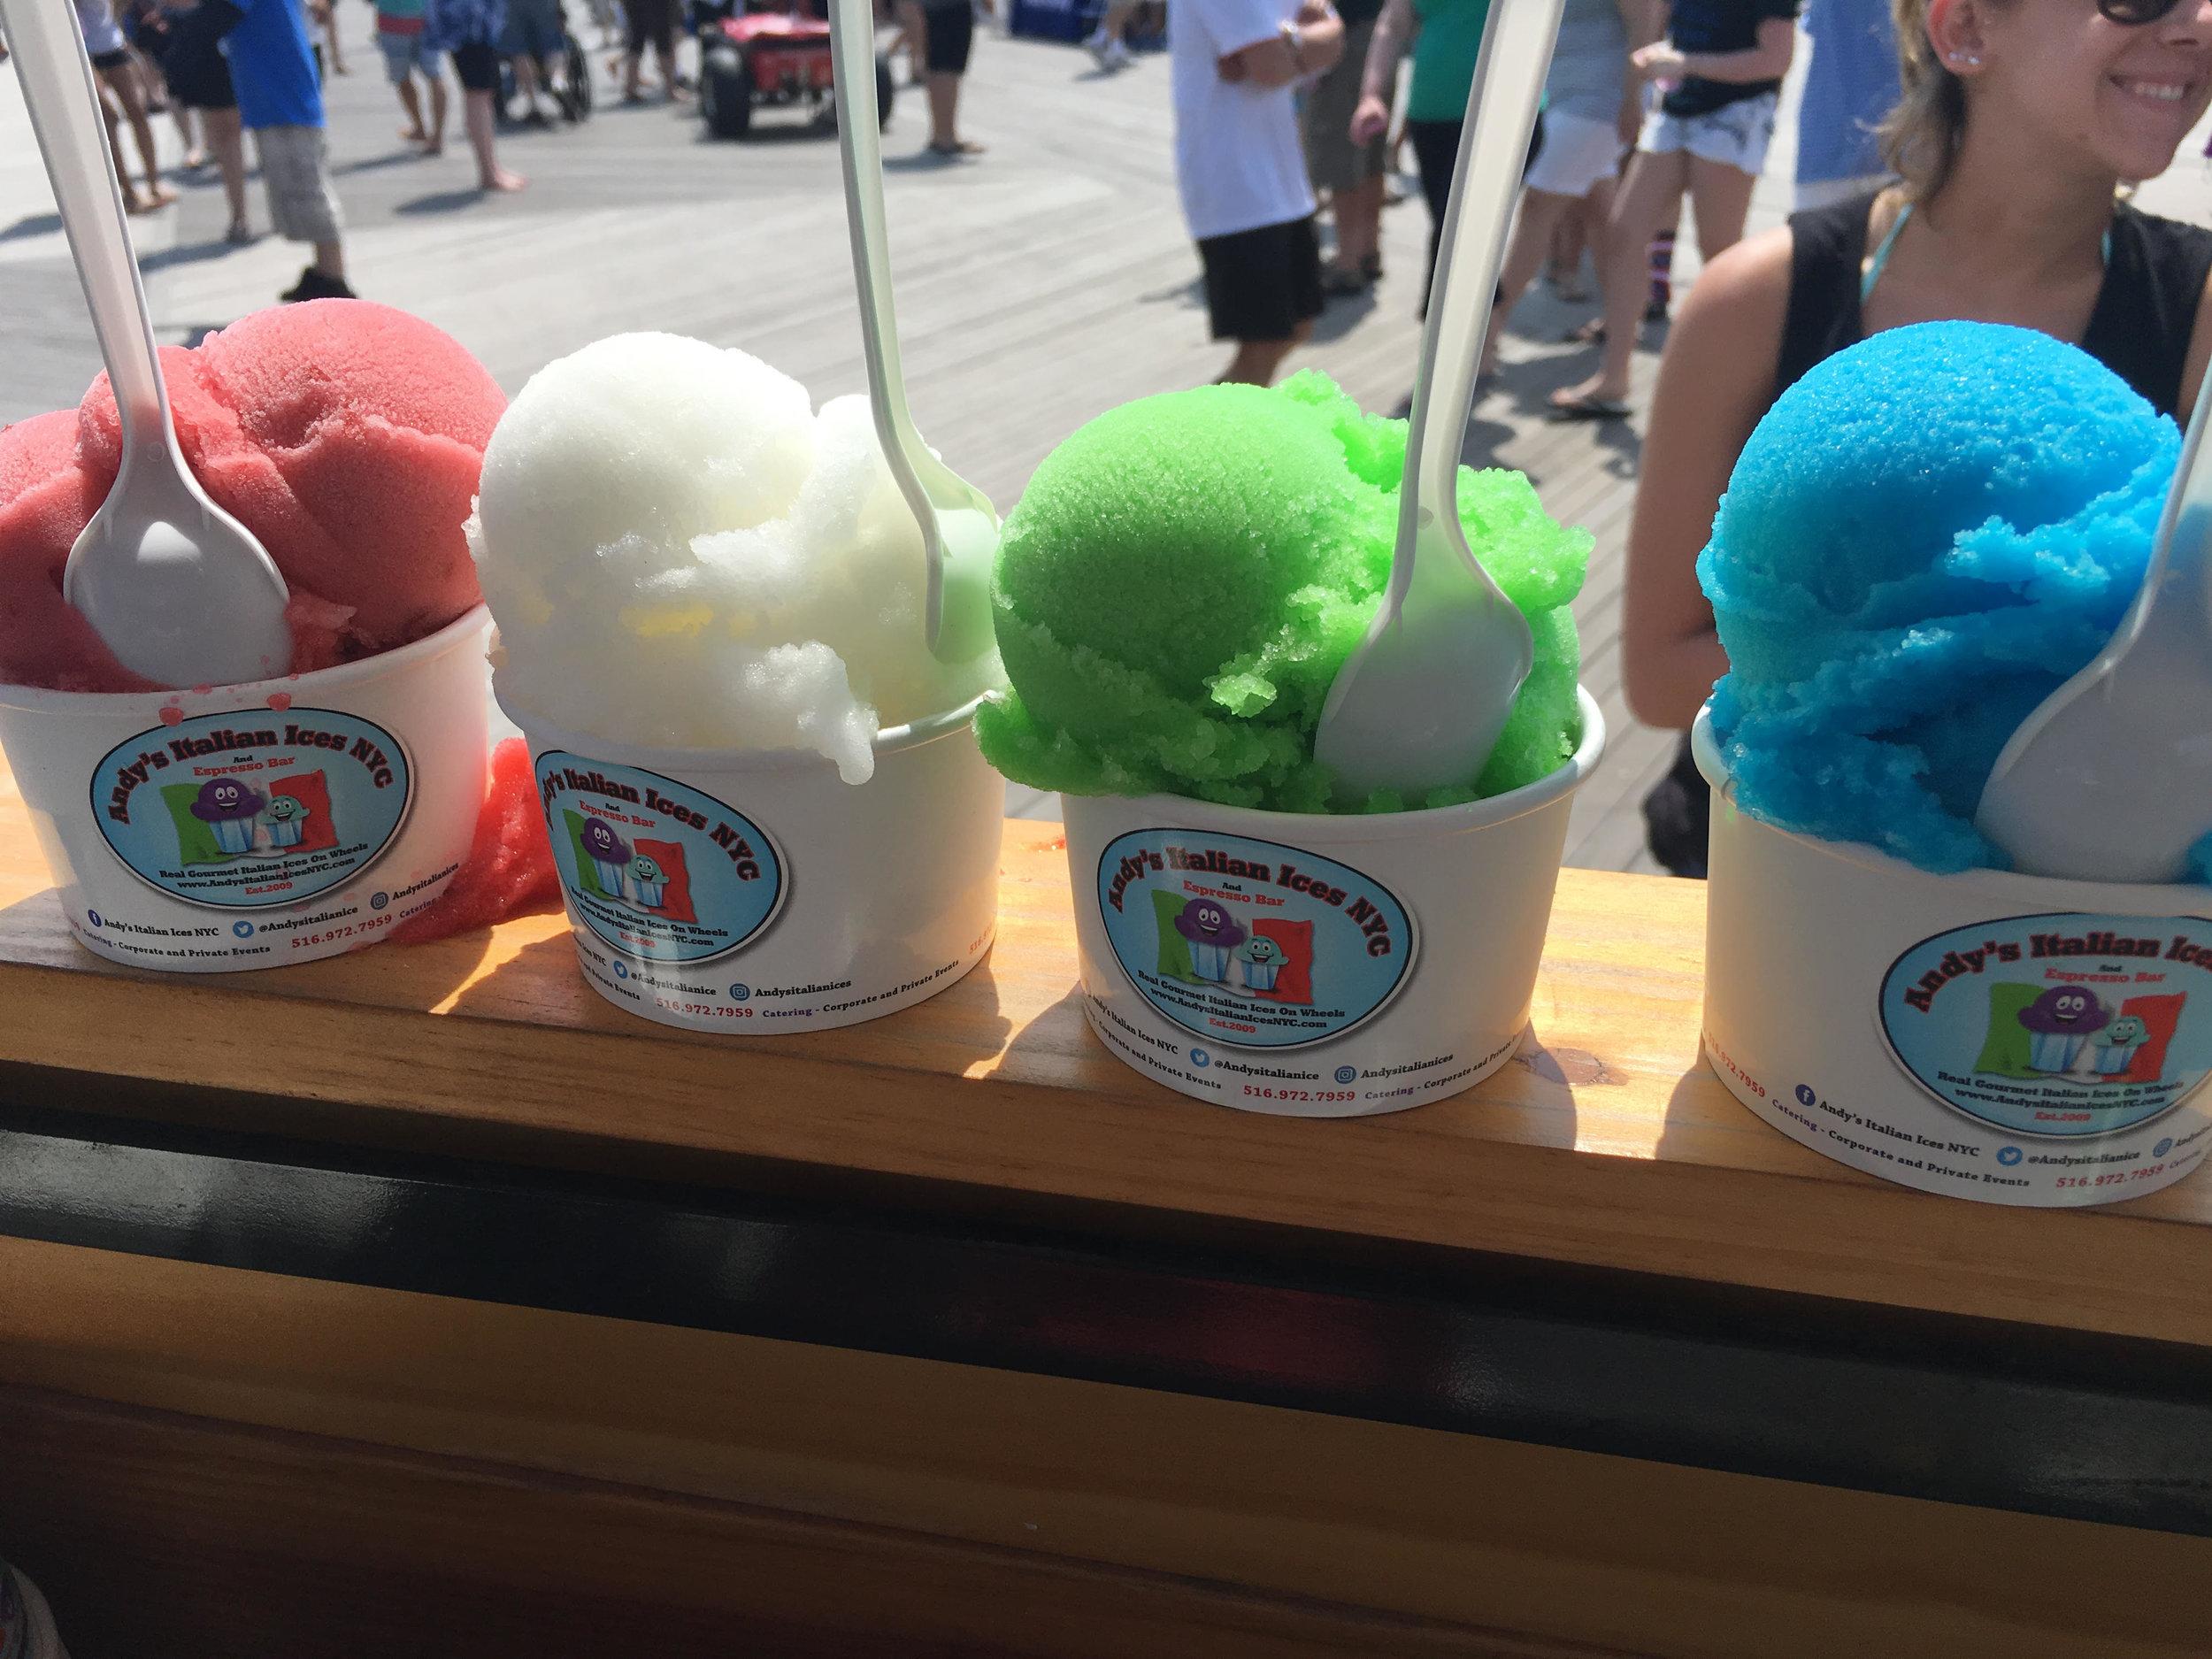 andys italian ice - flavor line up.jpg